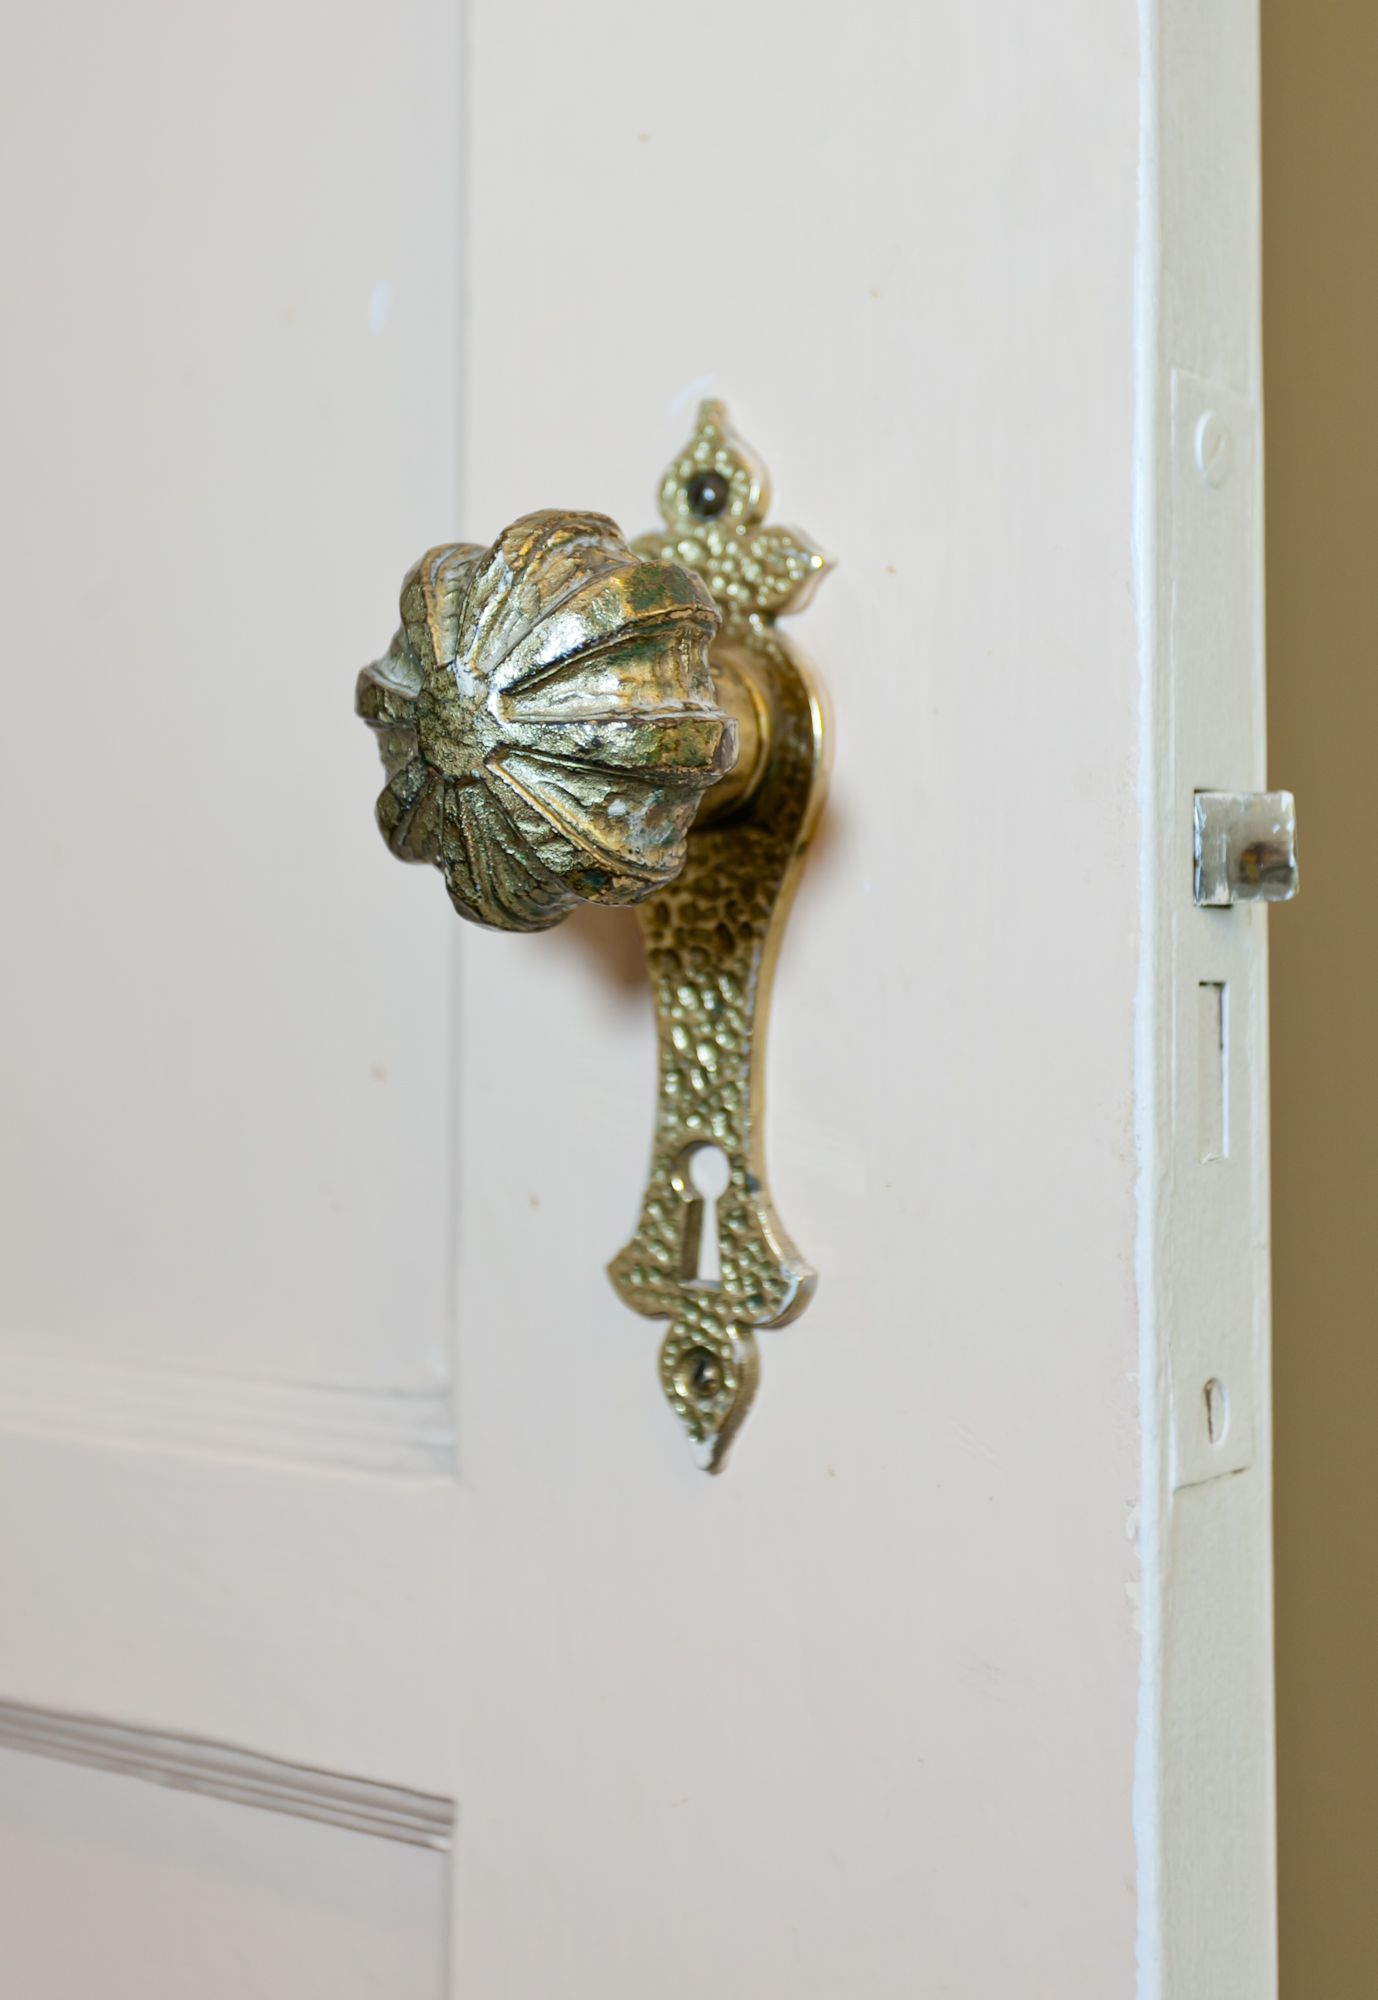 Ornate door knob...gorgeous!